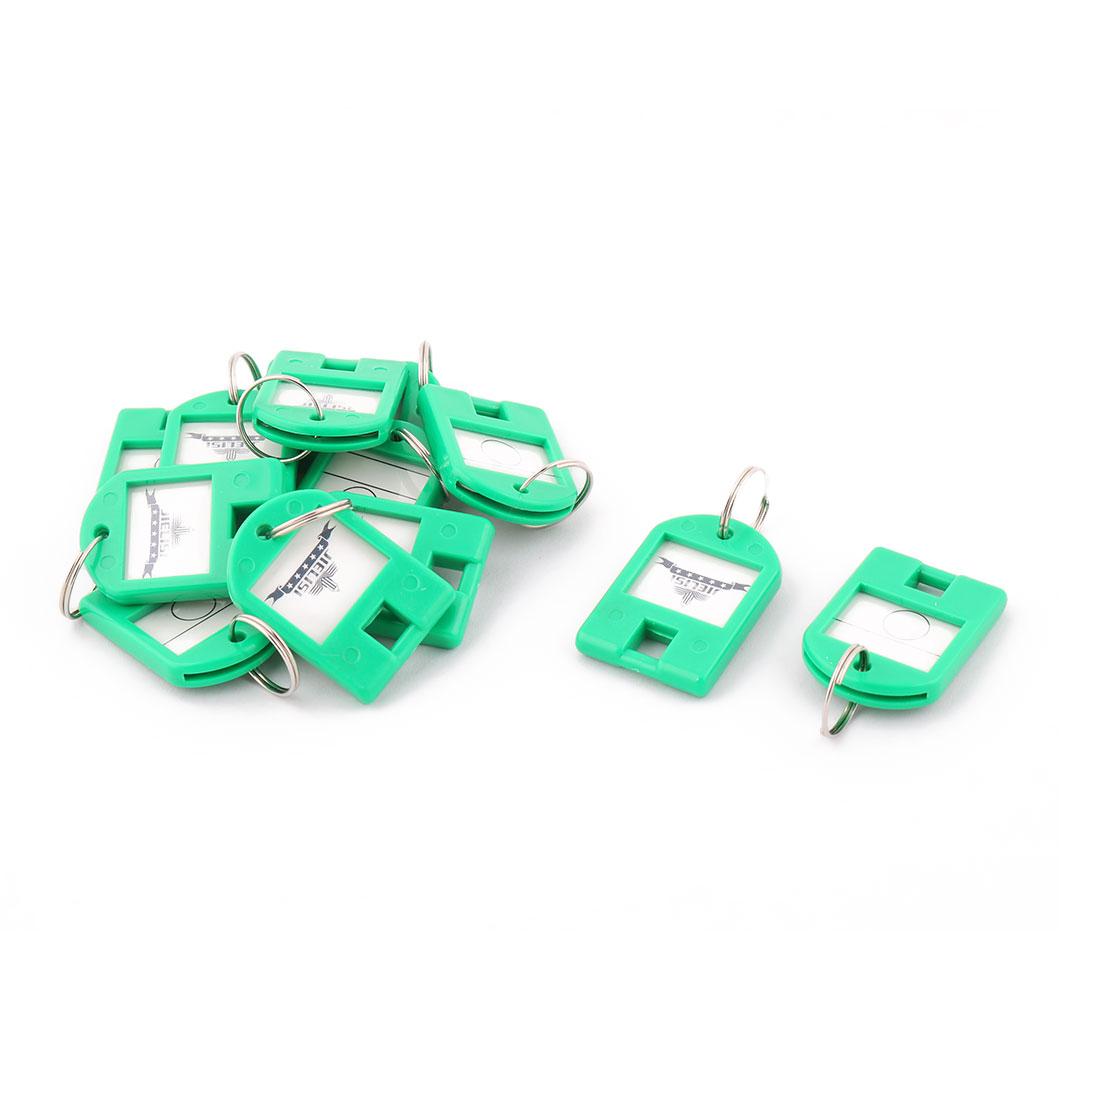 Plastic ID Label Name Tag Mark Metal Ring Key Fobs Luggage Bag Keyring Keychain Green 12pcs